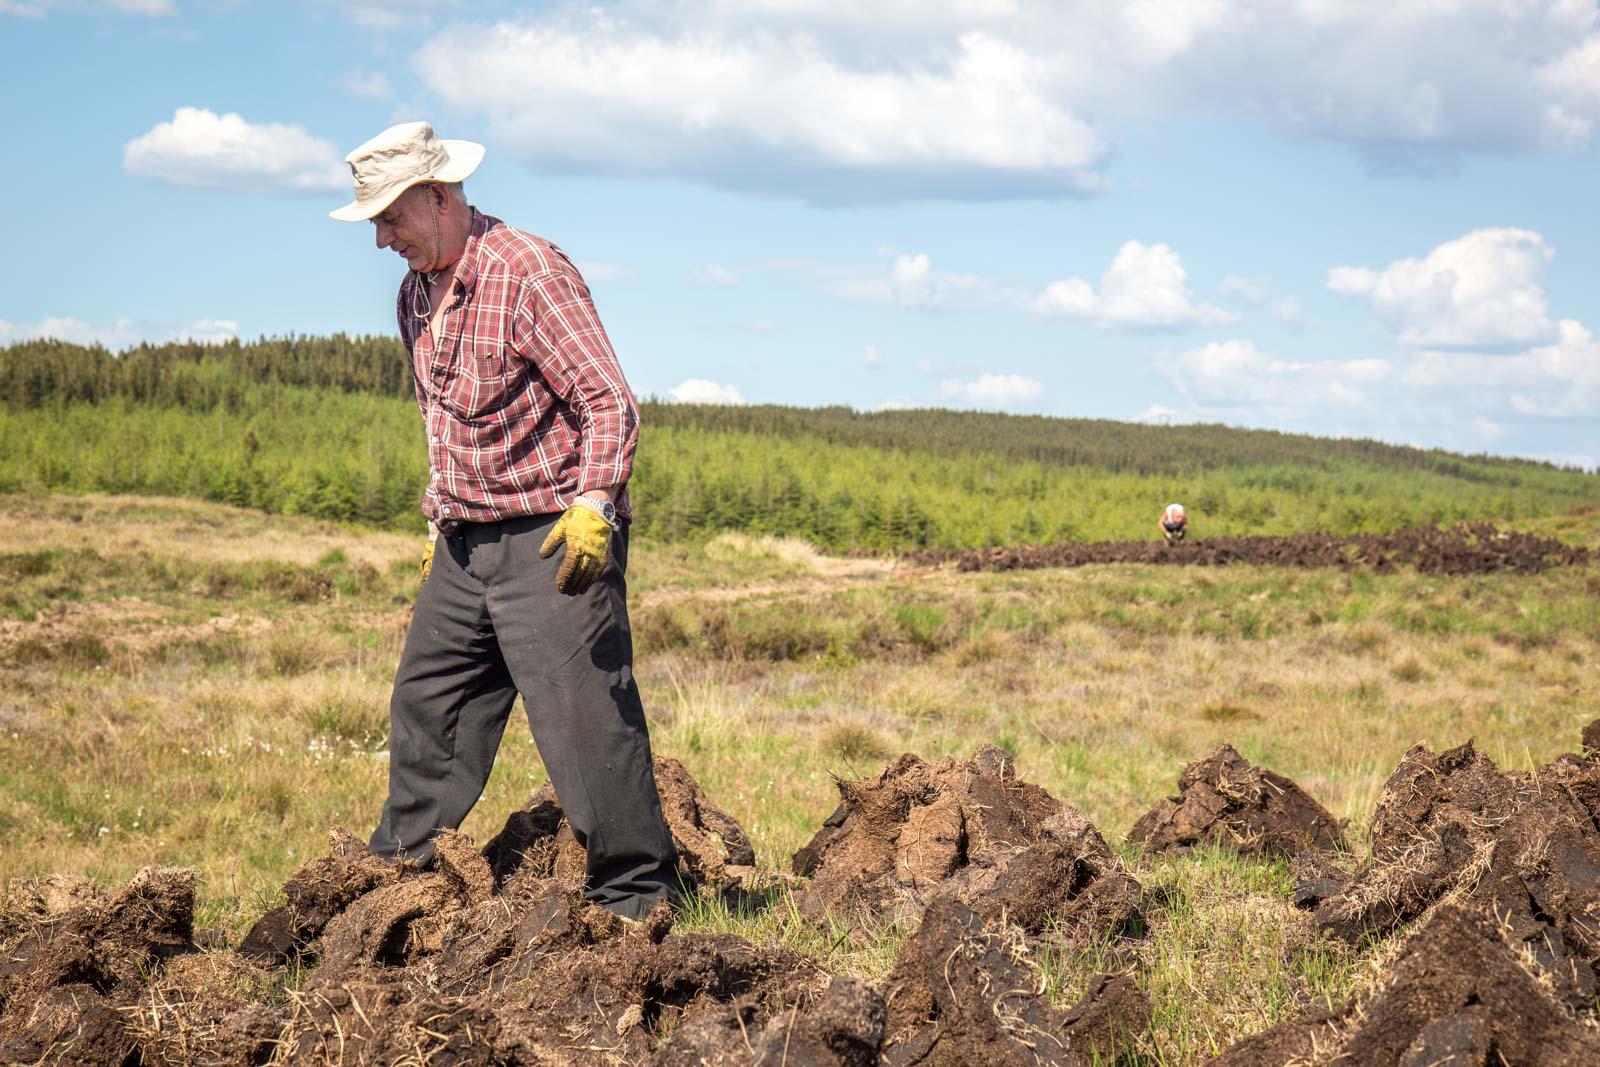 irish turf farming, peat bogs, ireland, turf peat